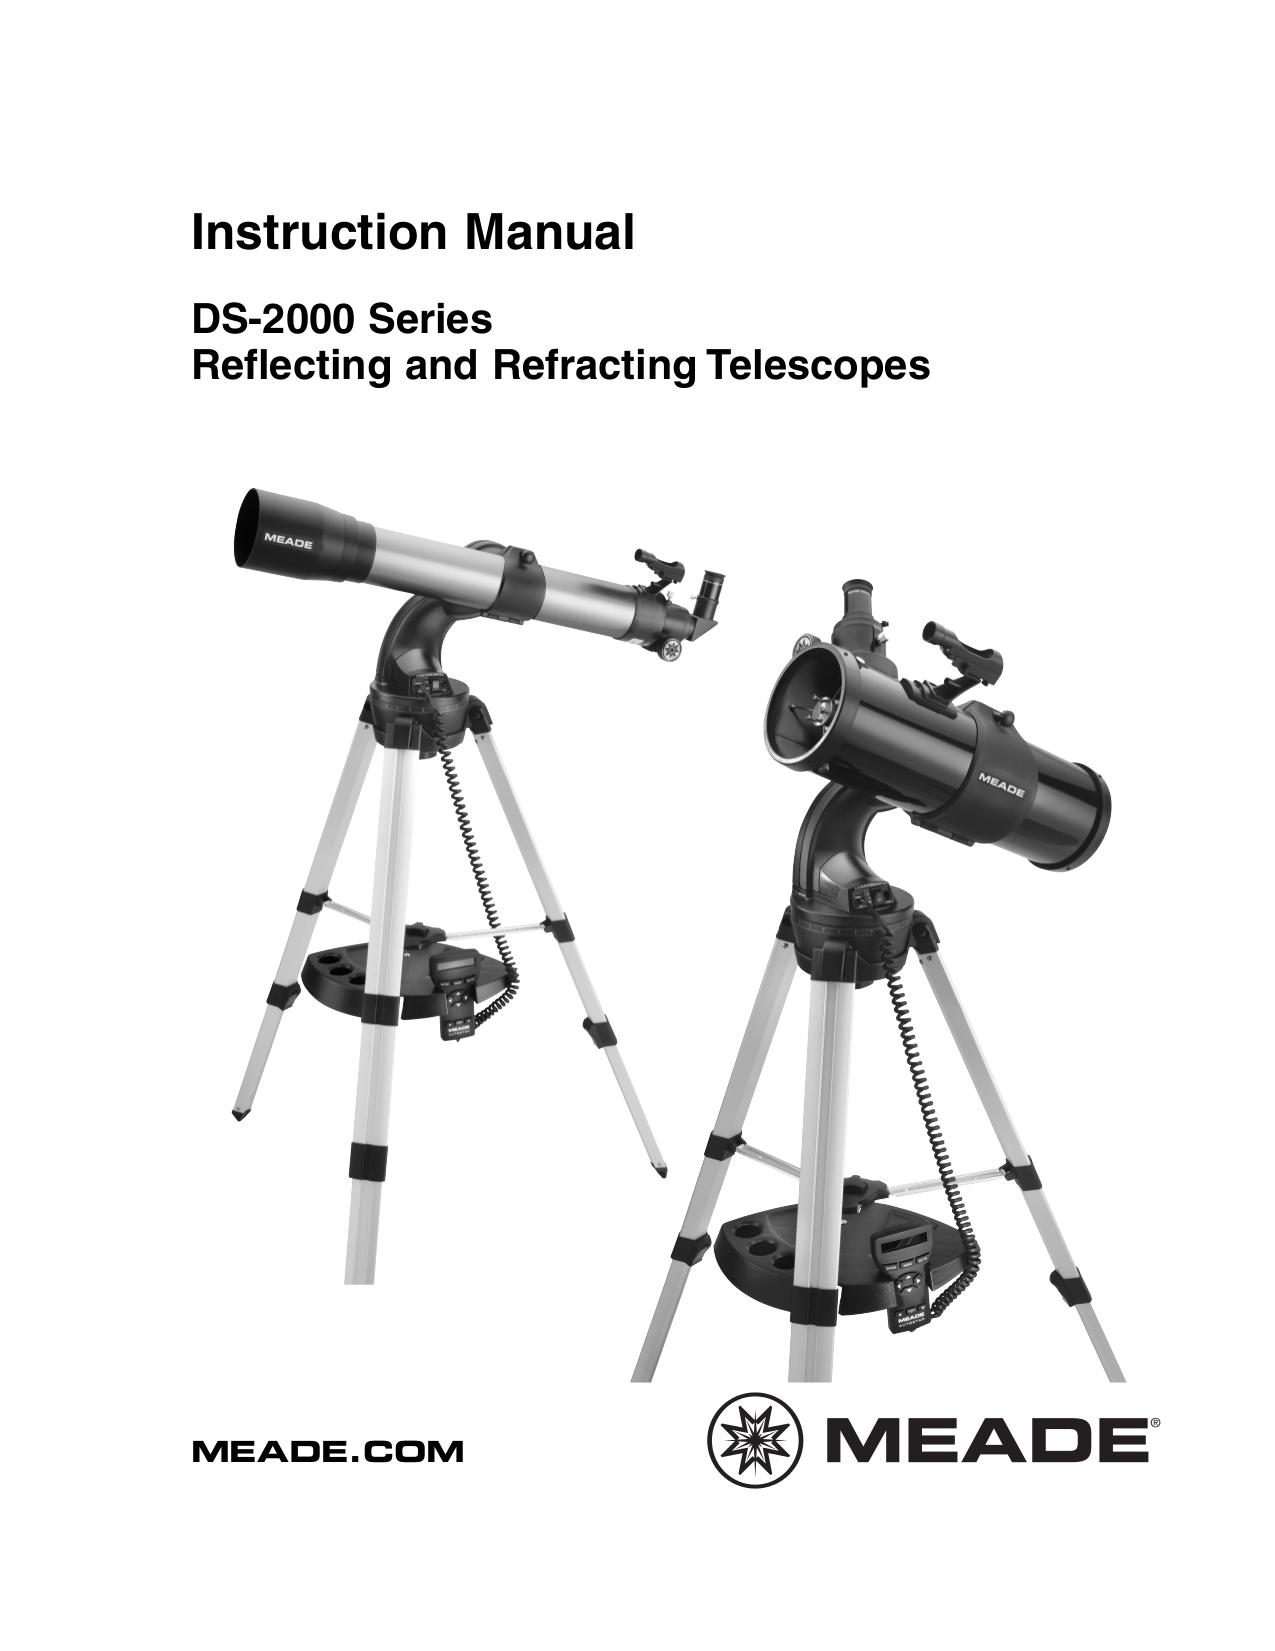 PDF manual for Meade Telescope DS-2102